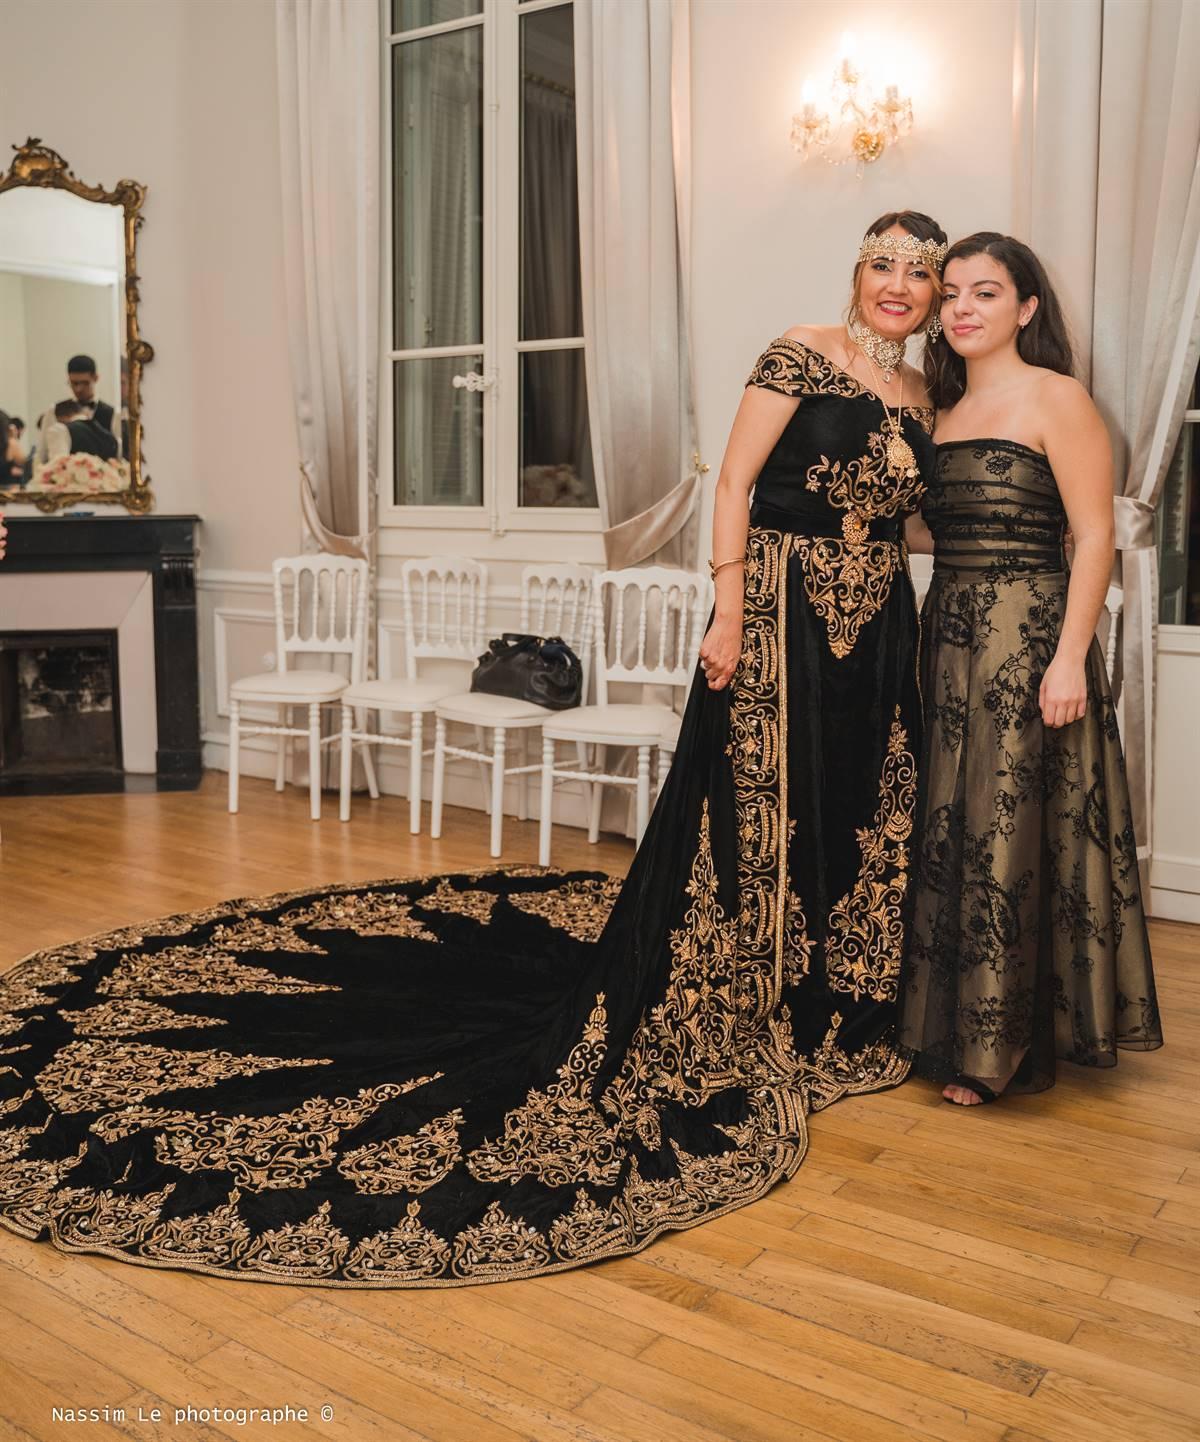 Pourquoi choisir ce Photographe mariage oriental 95